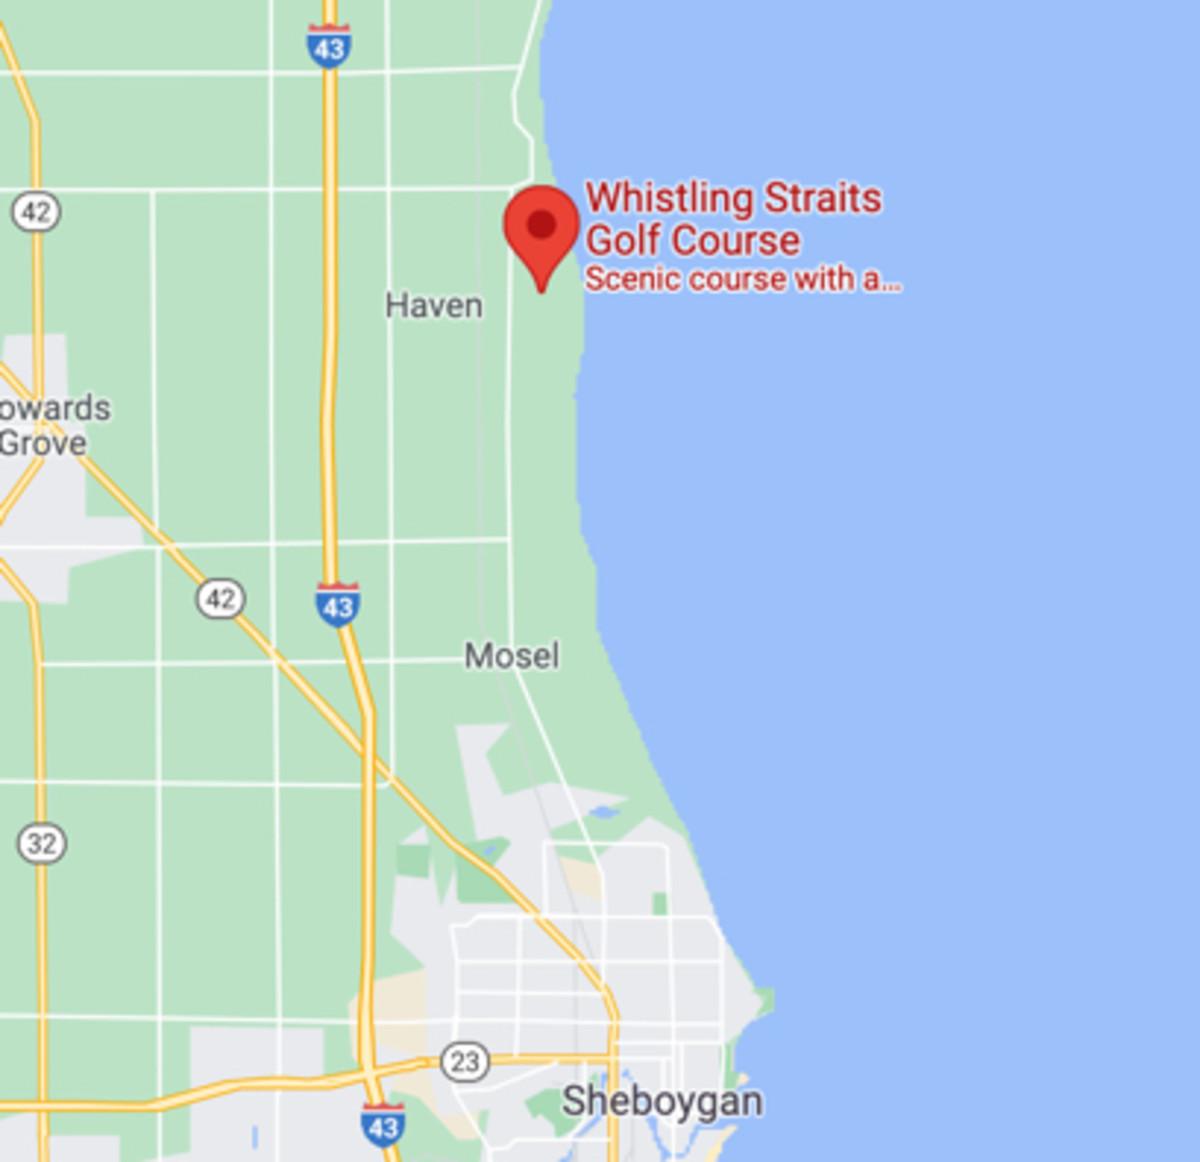 google-map-whistling-straits